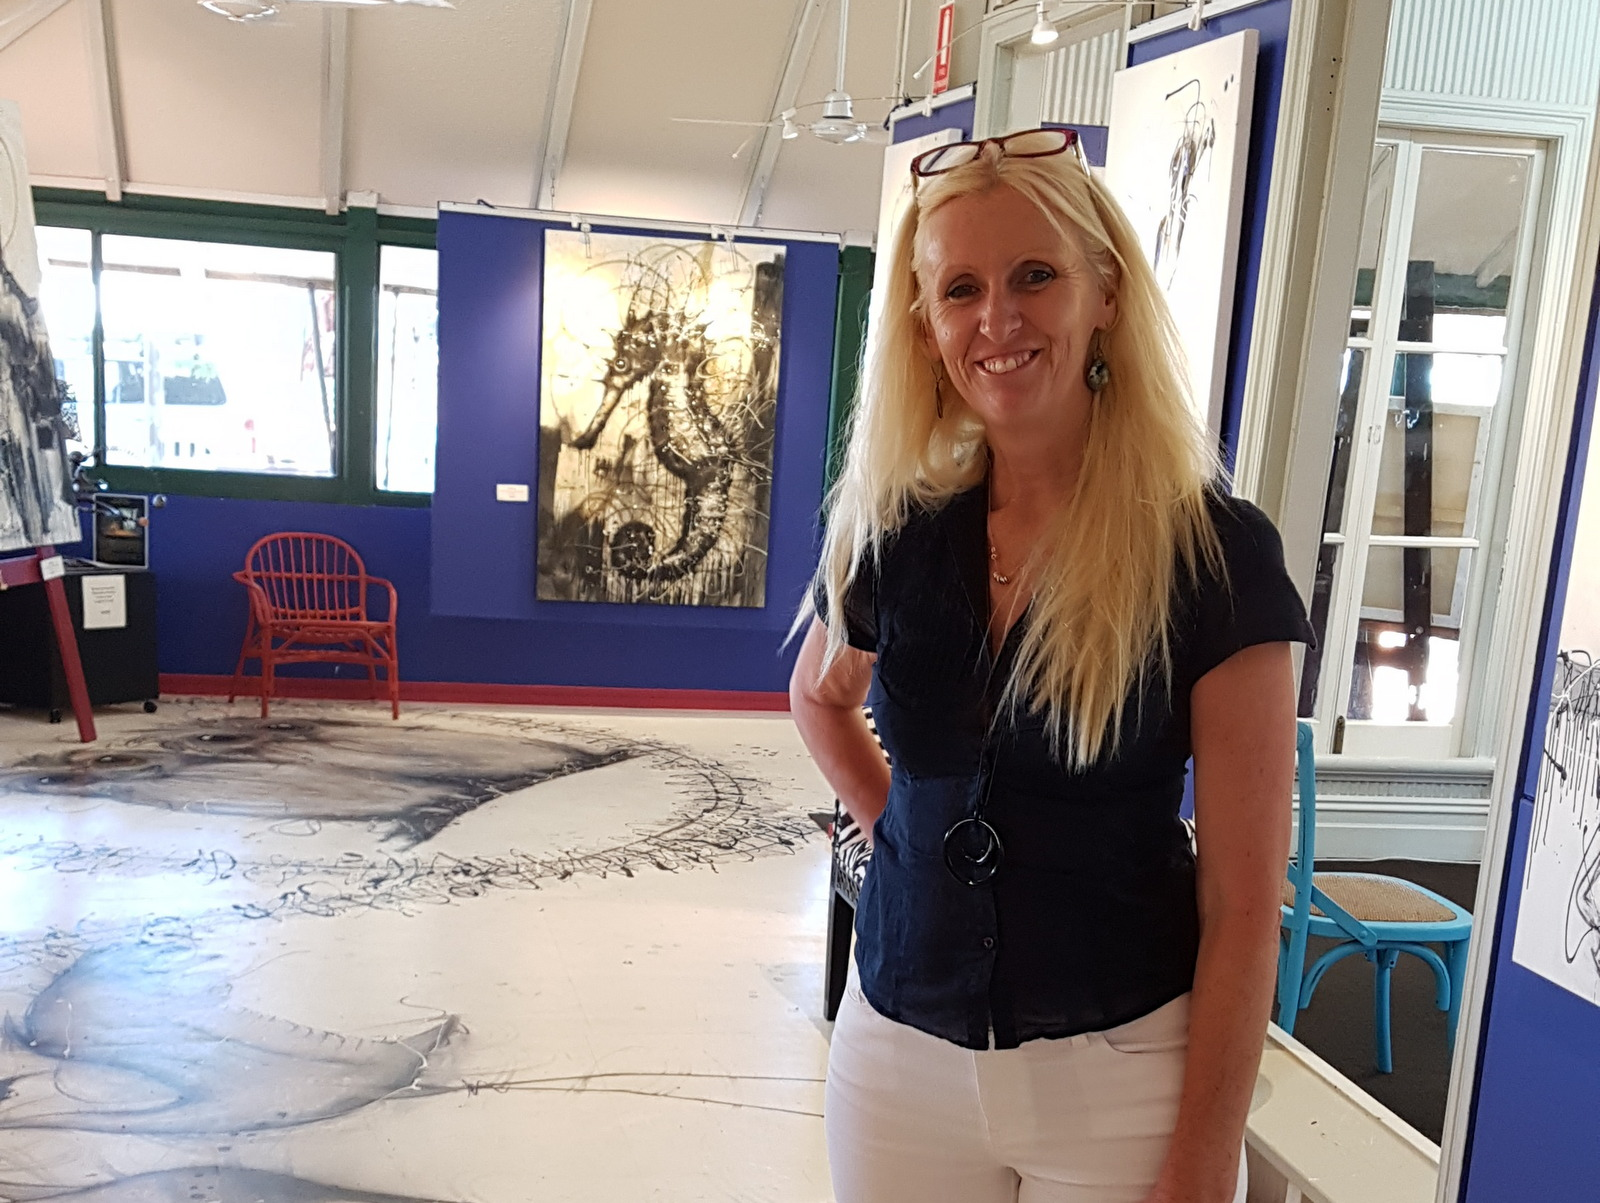 Sobrane in her Broome WA studio